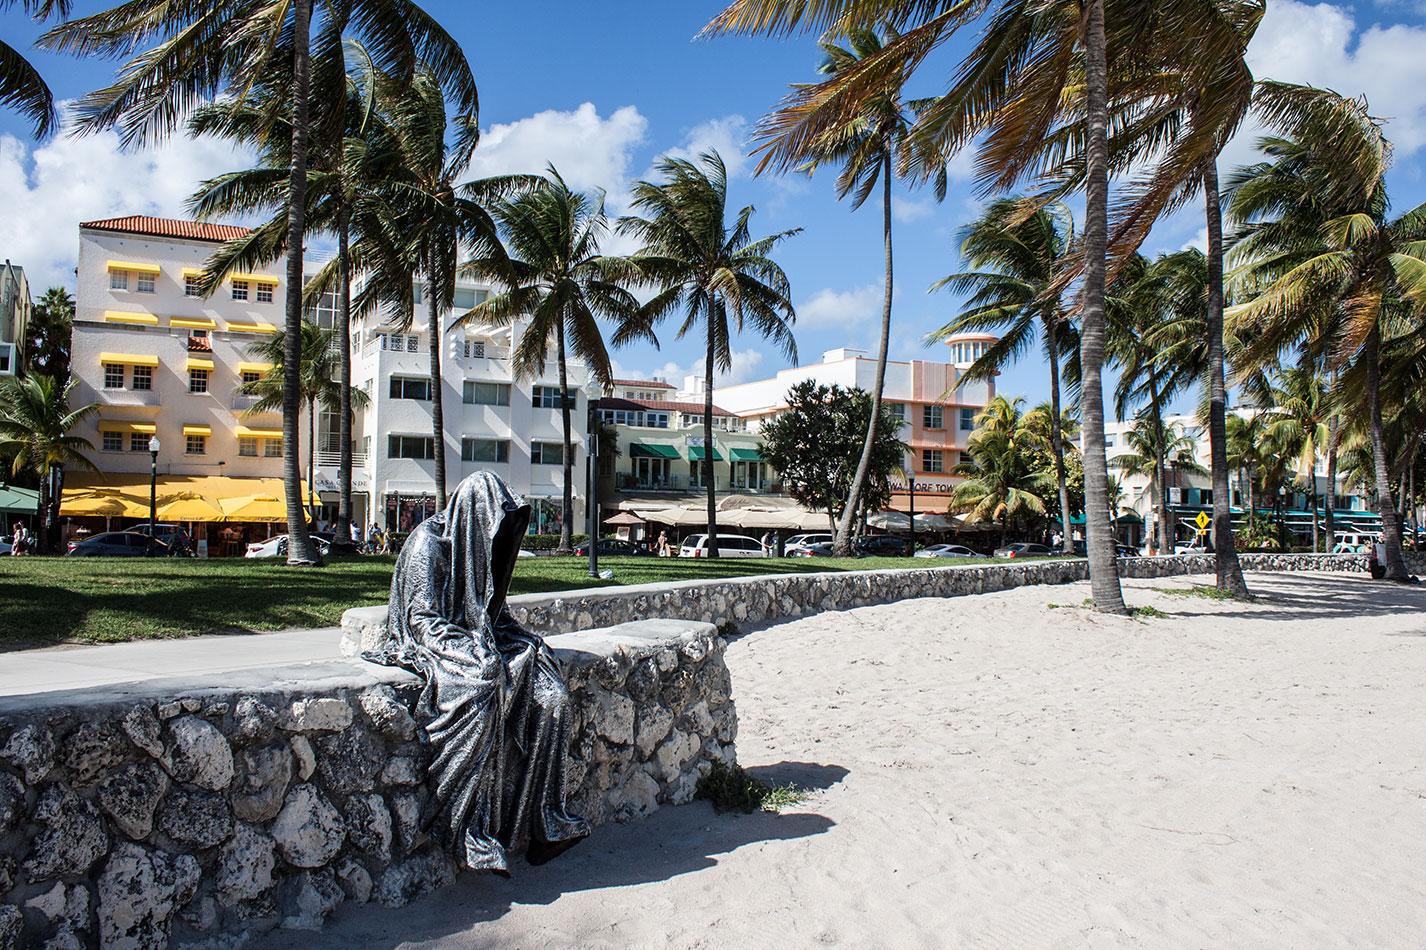 public-art-basel-miami-beach-fair-usa-florida-bass-museum-guardians-of-time-manfred-kili-kielnhofer-contemporary-fine-art-modern-arts-design-antiques-sculpture-6550